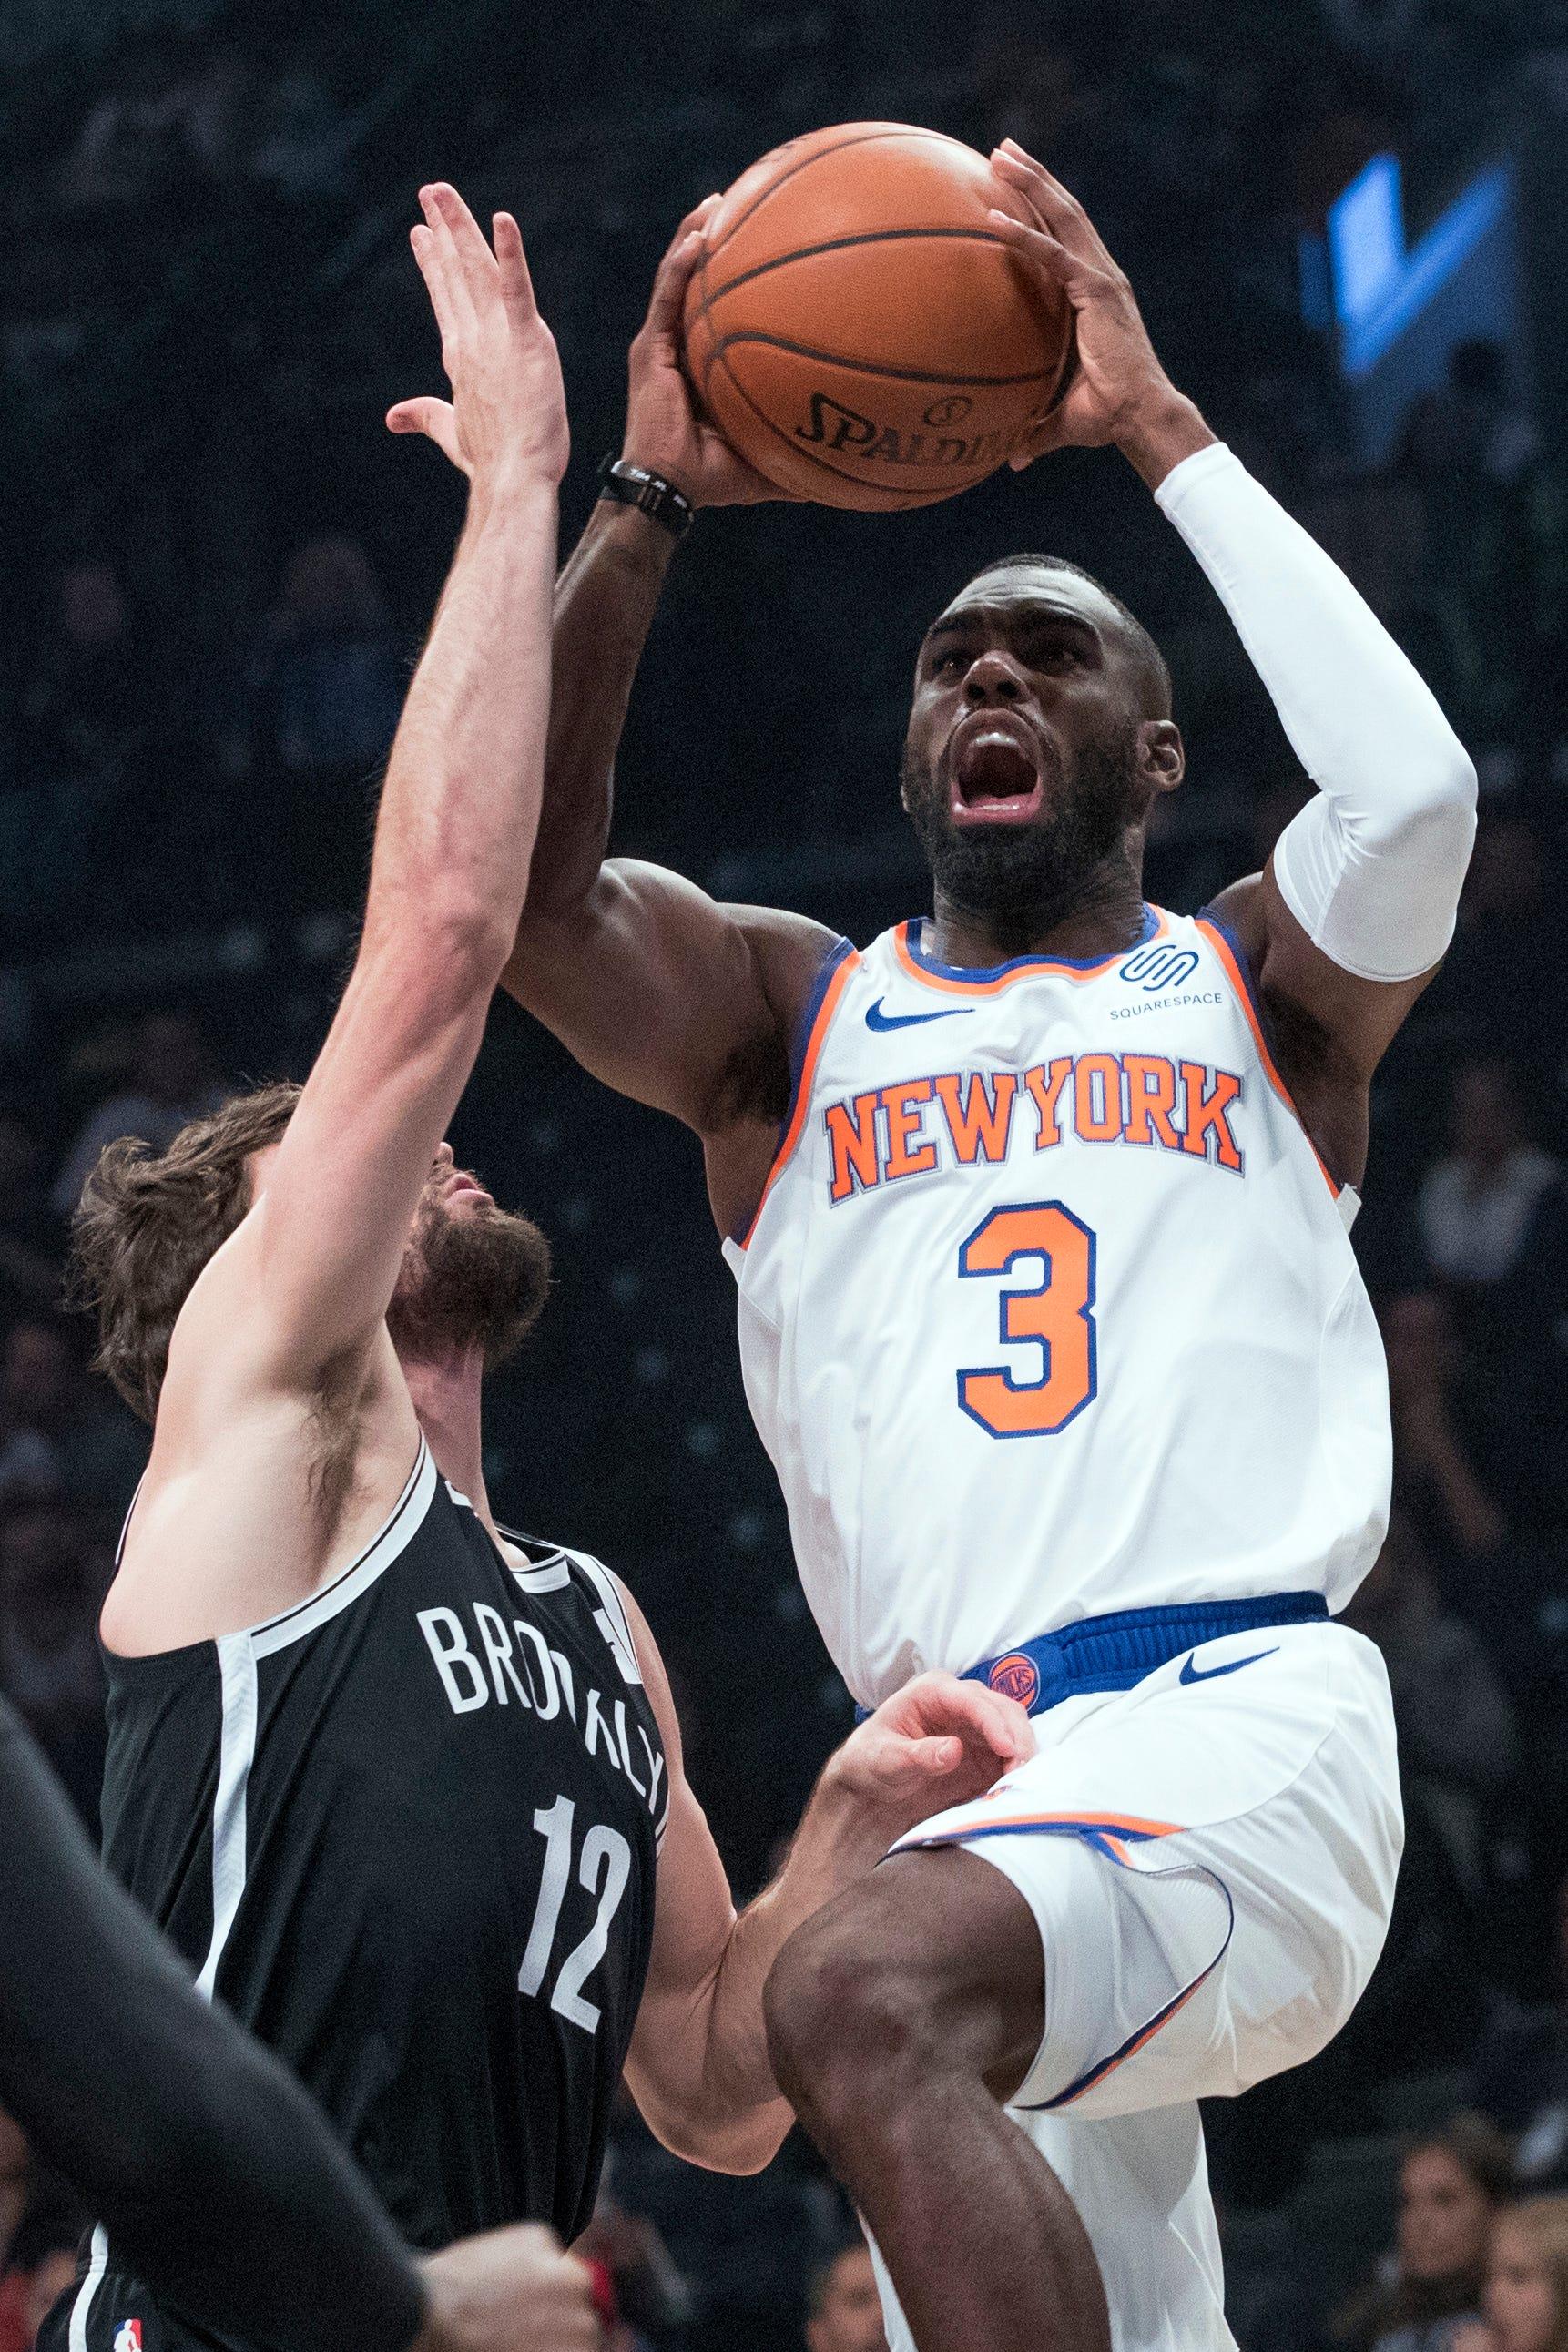 separation shoes ae78f 878de 56ecab15-e7d1-4078-907f-f2e8b8e16a4a-Knicks Nets Basketball 9.JPG